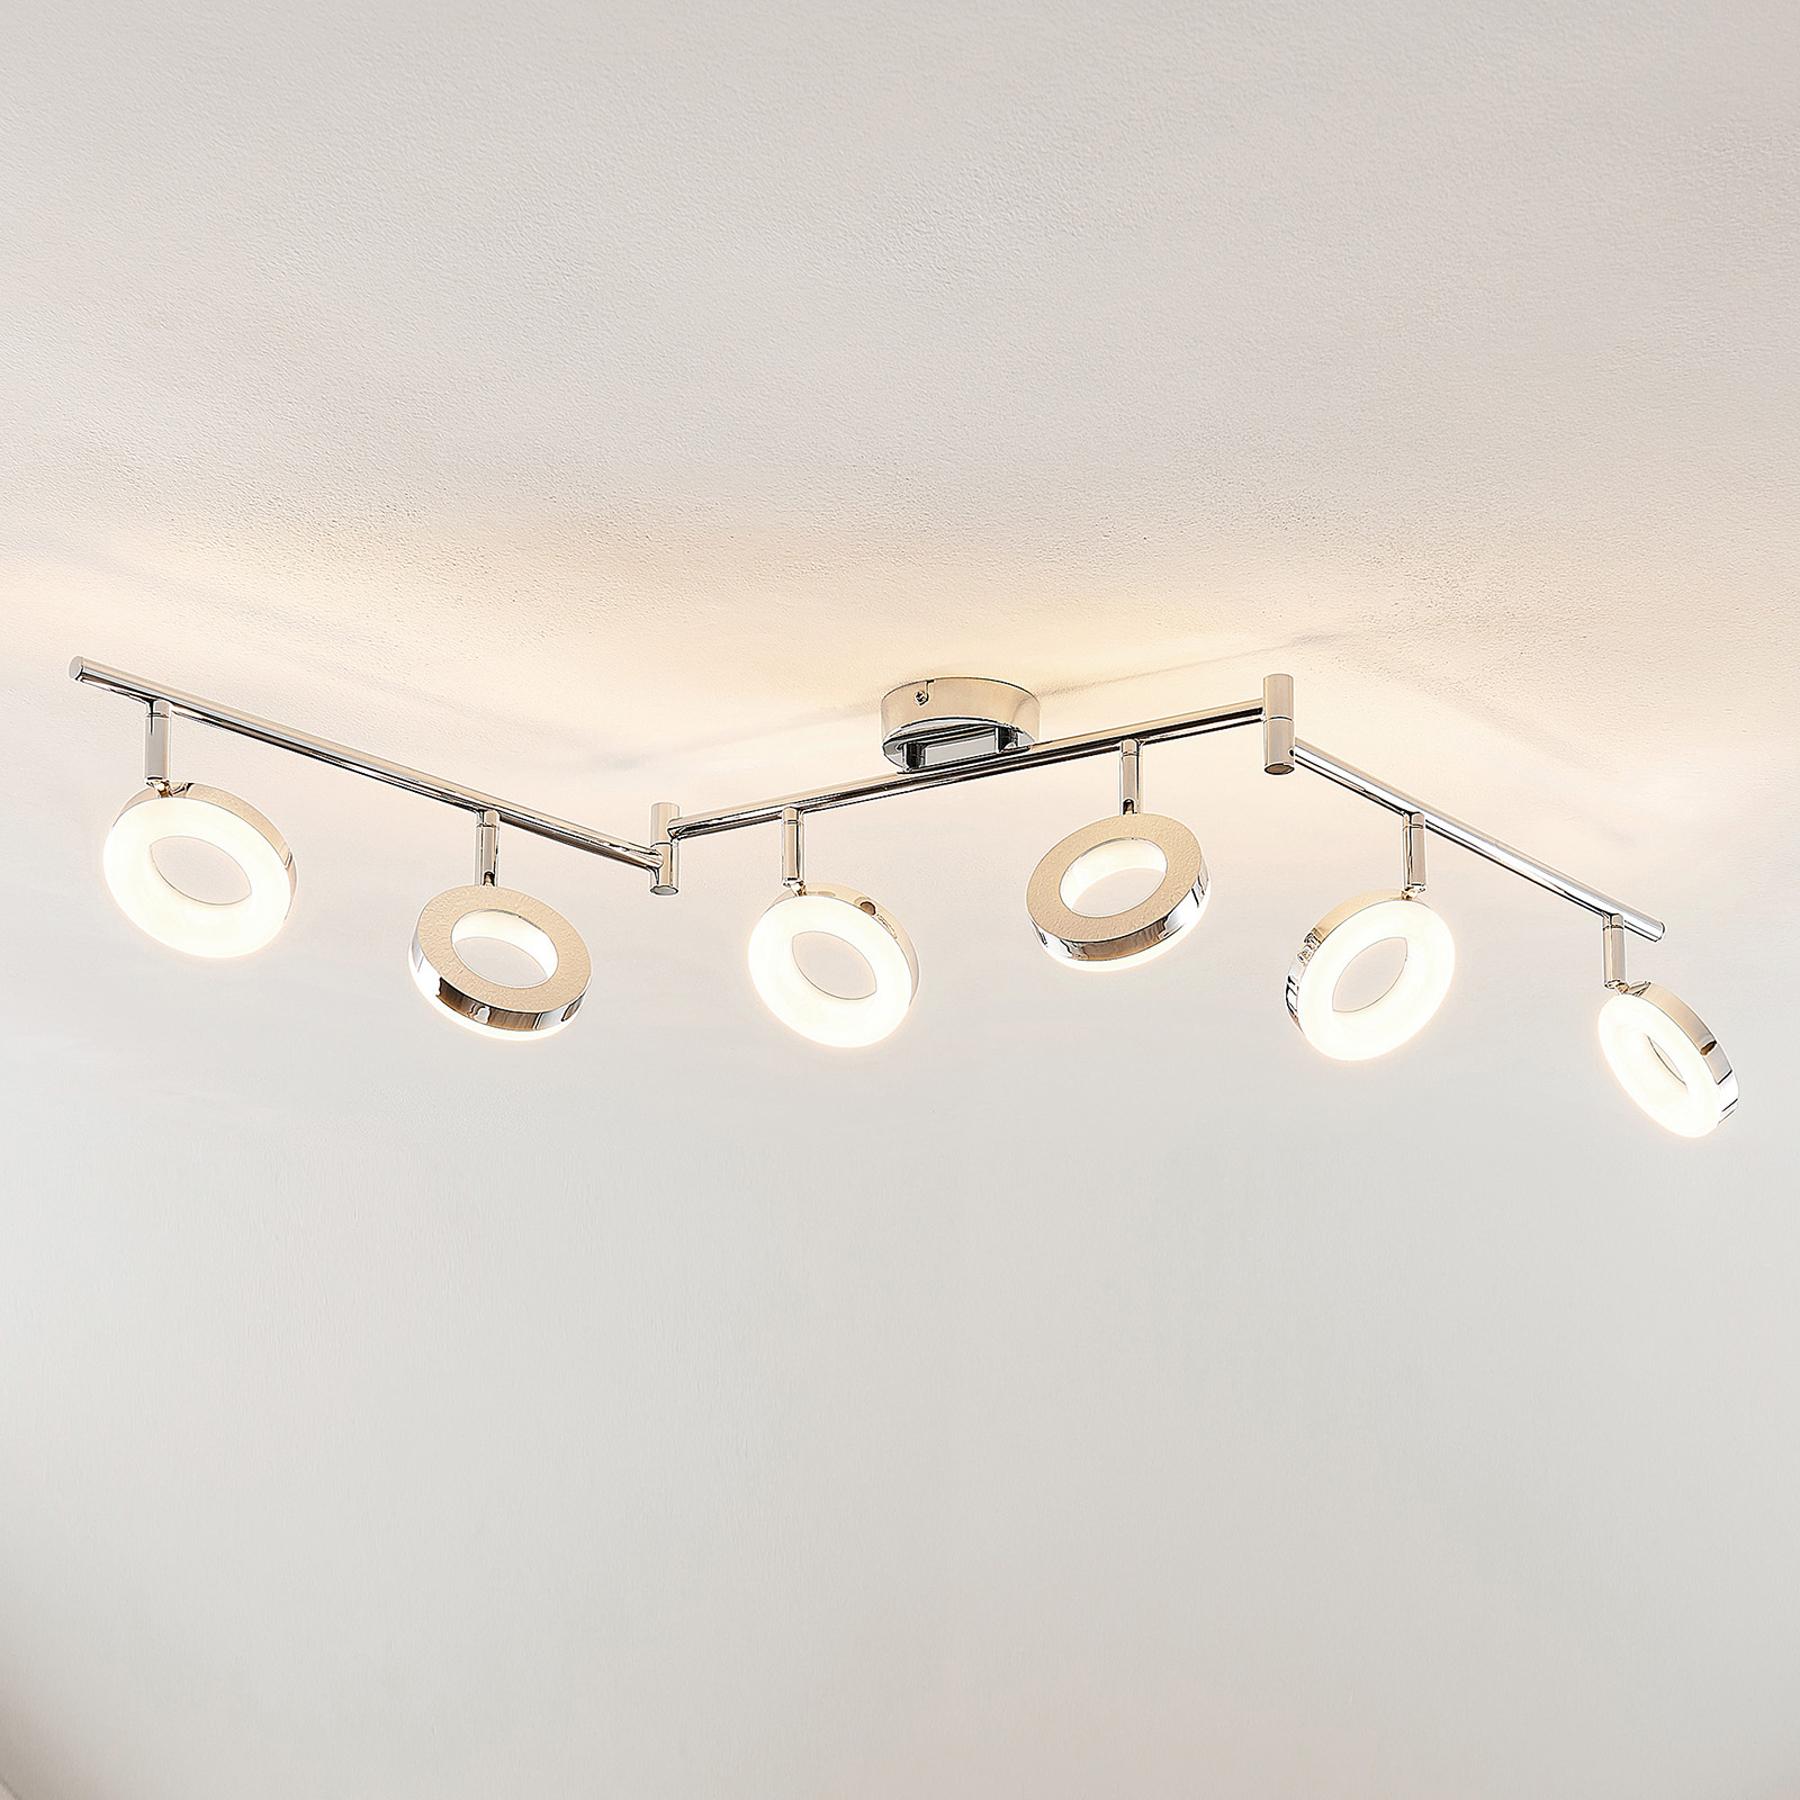 ELC Tioklia LED plafondlamp, chroom, 6-lamps